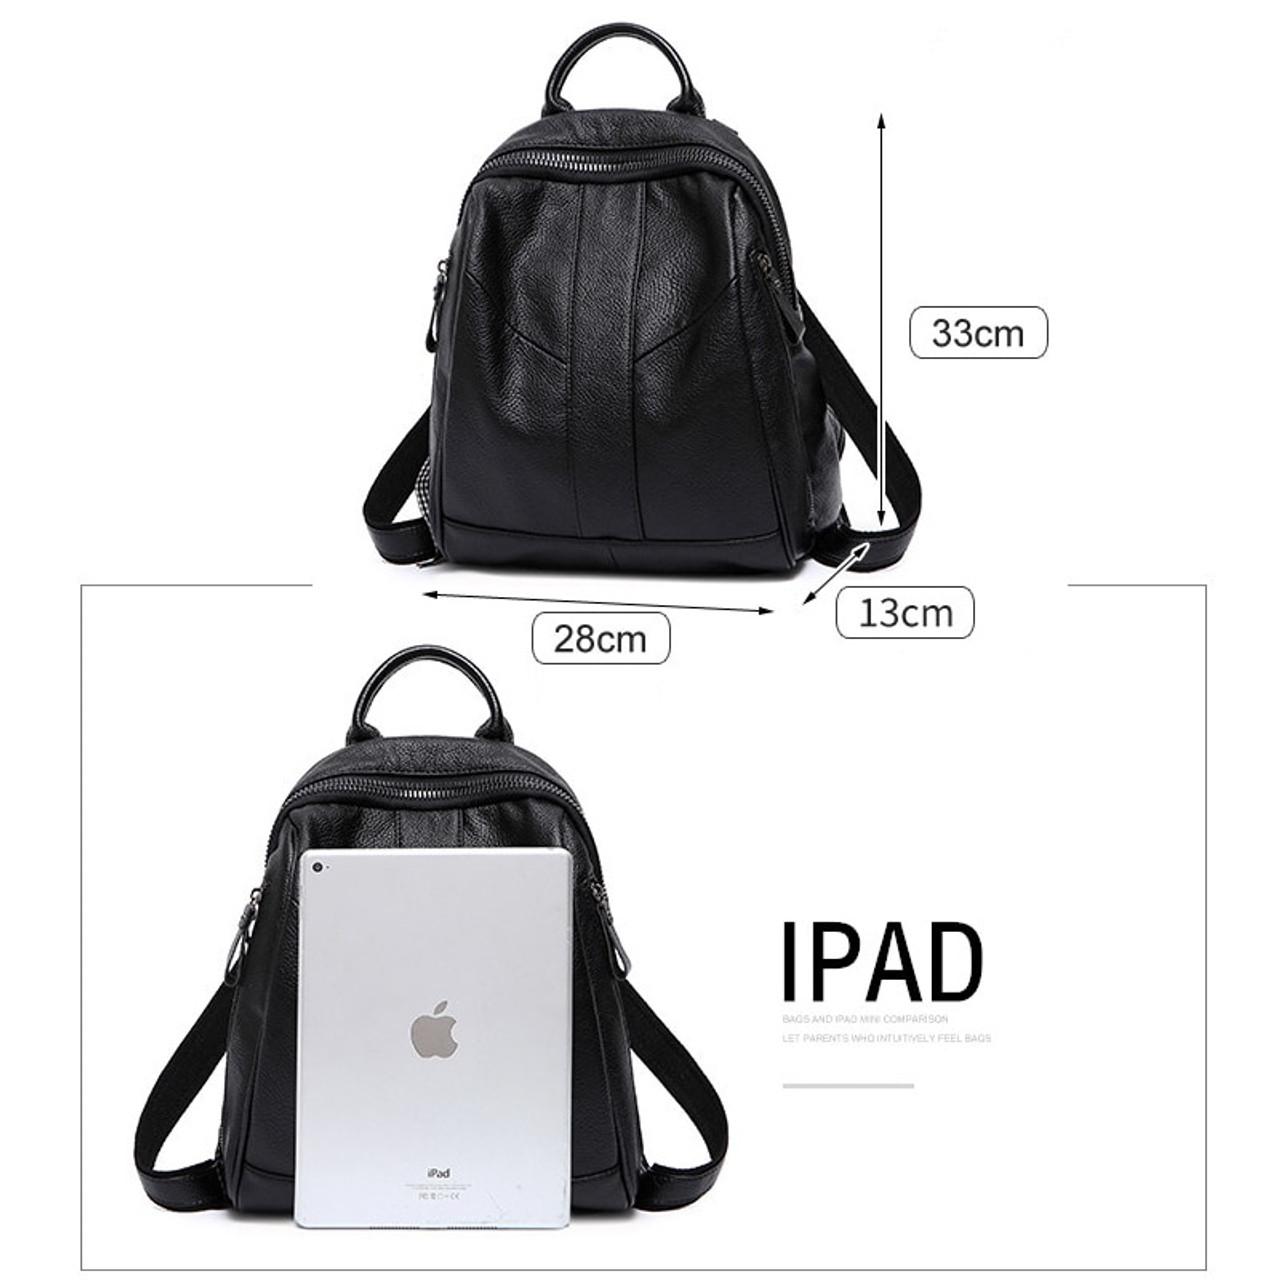 9721d89220ee8 ... LUISE Brand Women s Real Leather Backpack Designer Ladies Backpack  Korean School Back Bags Fashion Bookbag Back ...